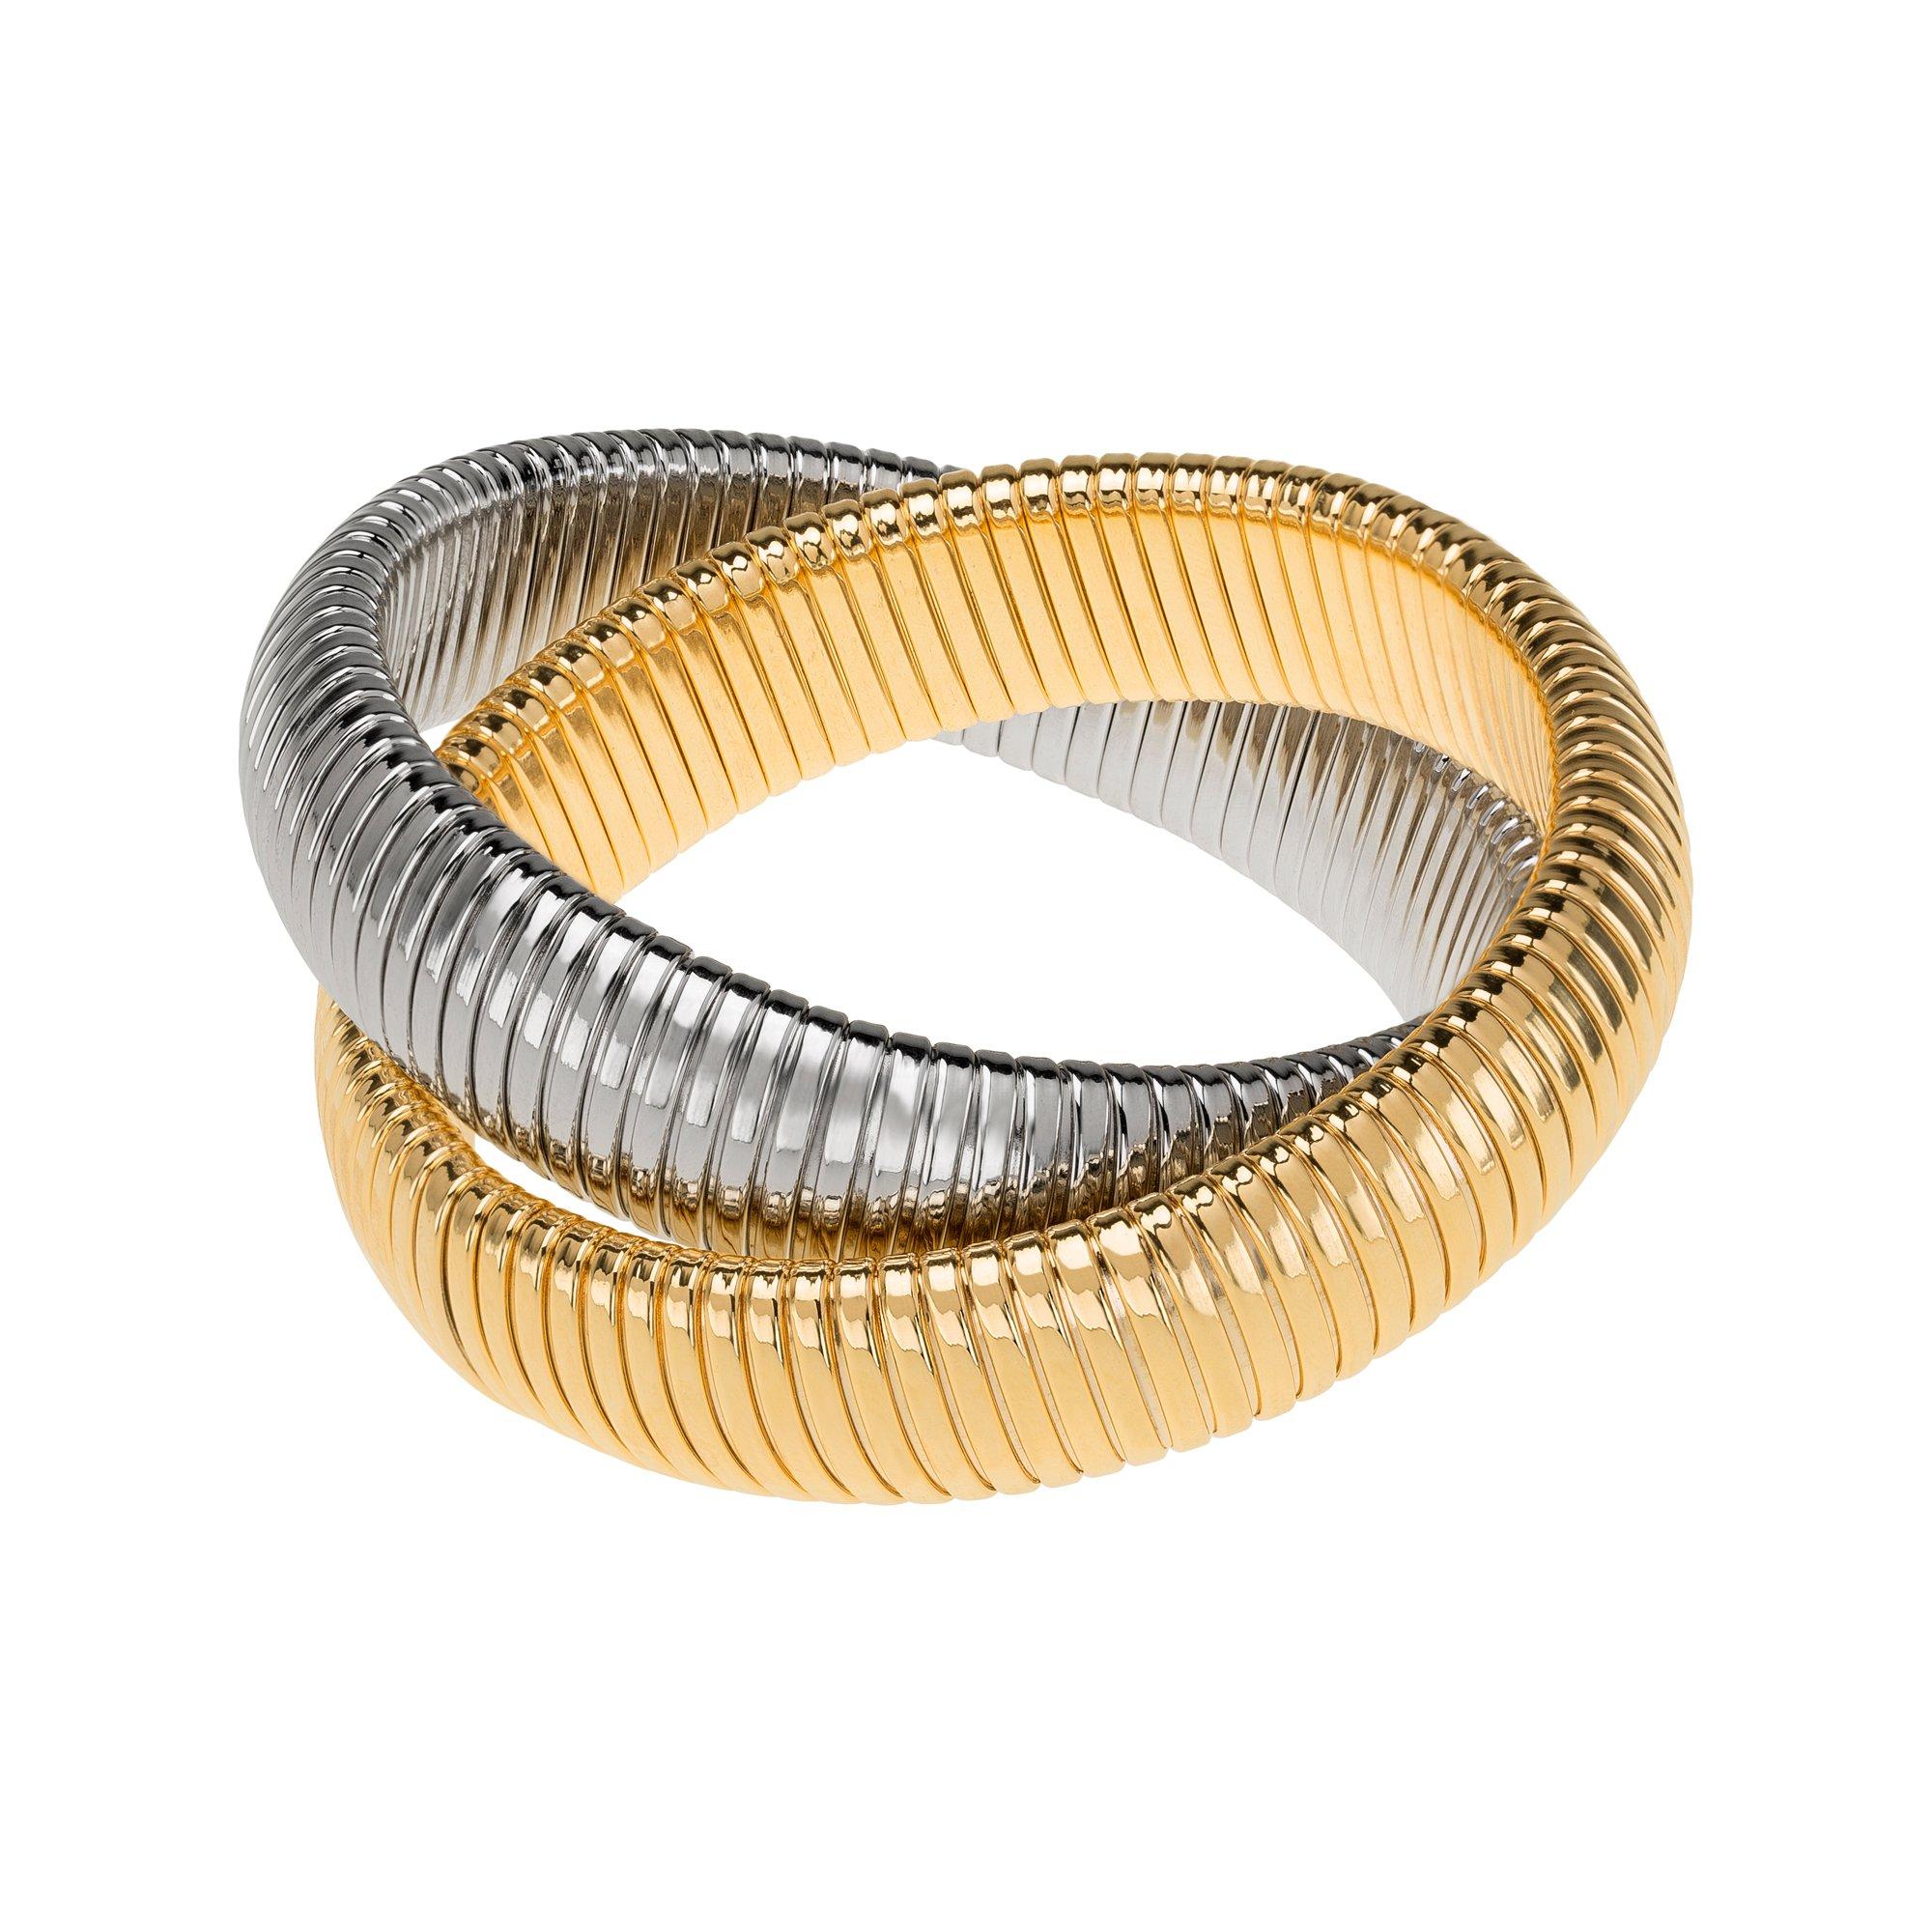 Janis Savitt Double Cobra Bracelet by JANIS BY JANIS SAVITT